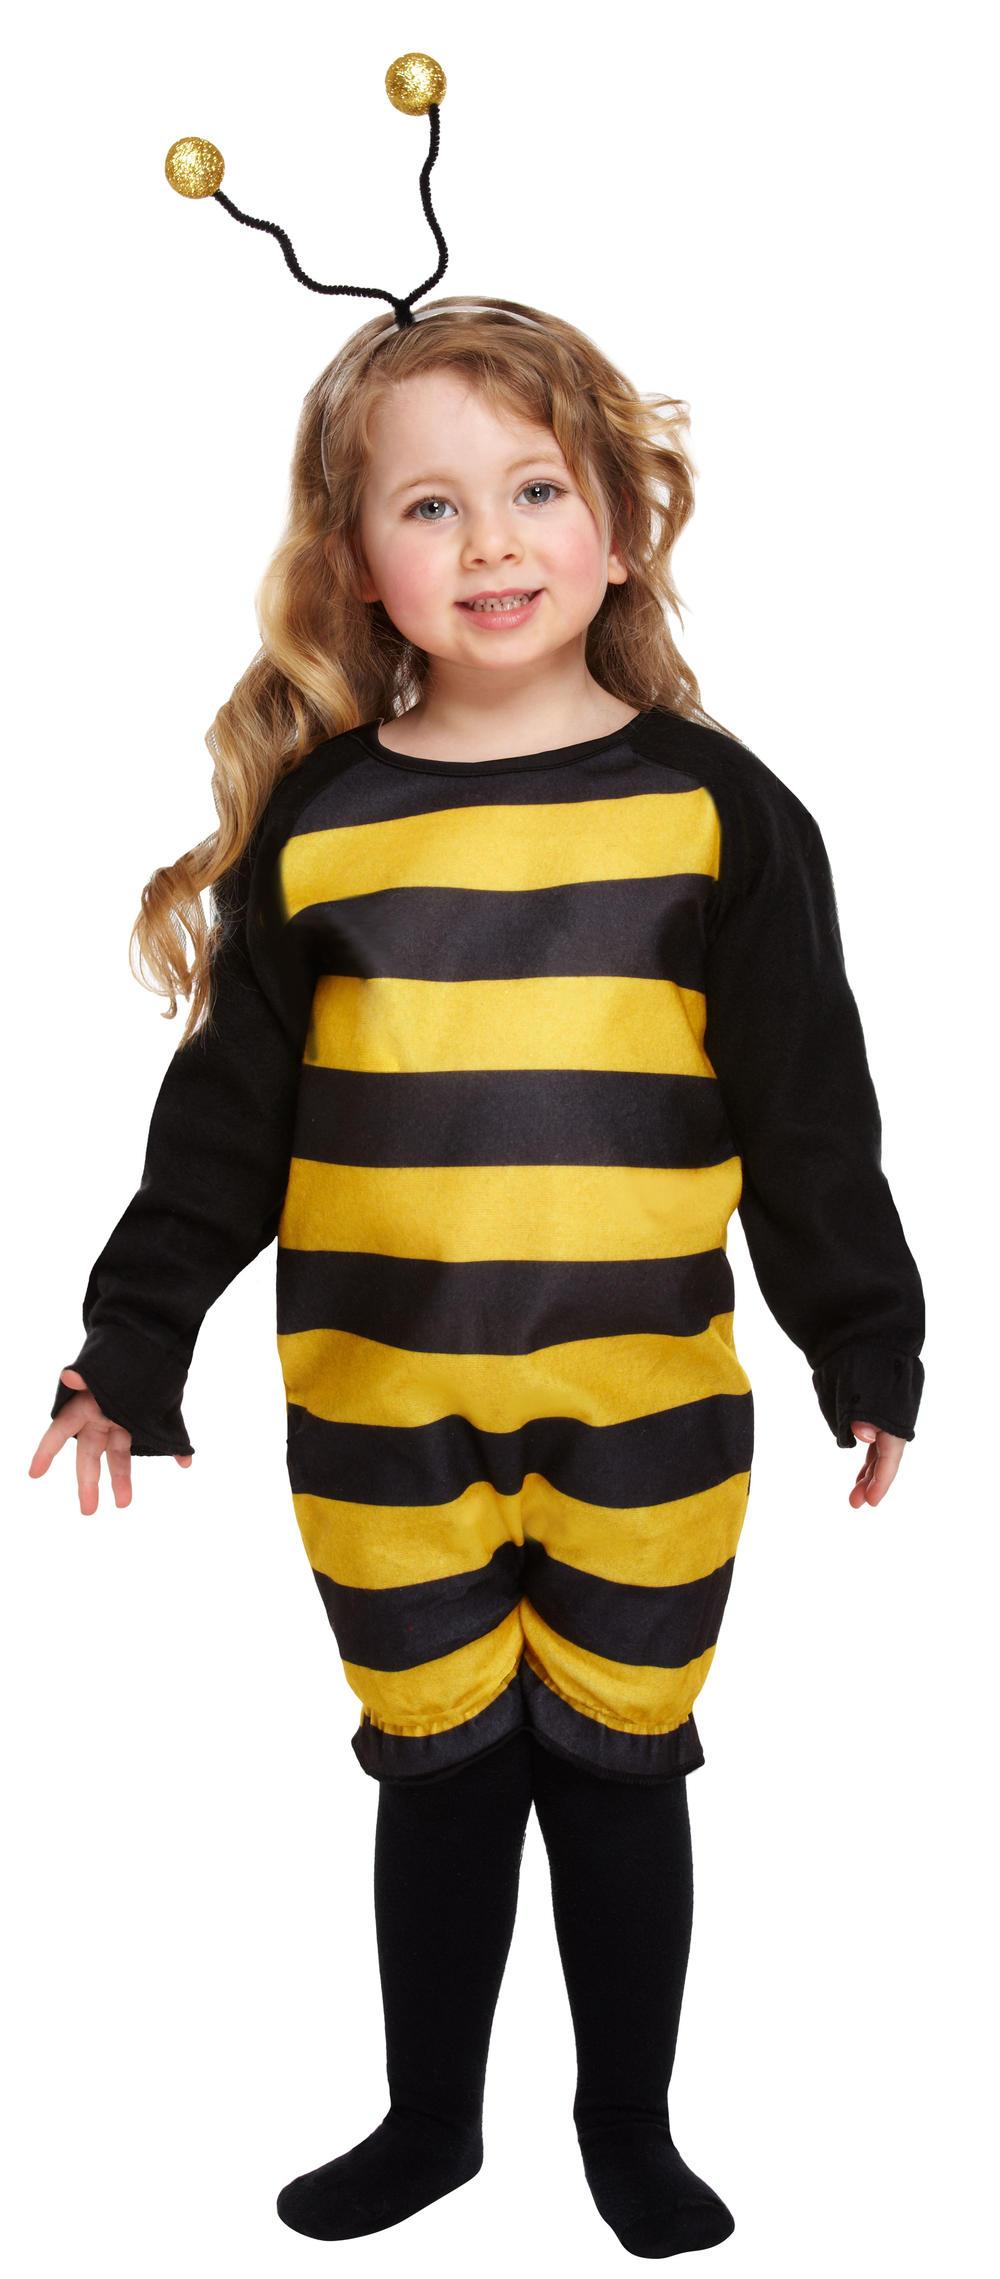 Kid's Bumble Bee Costume